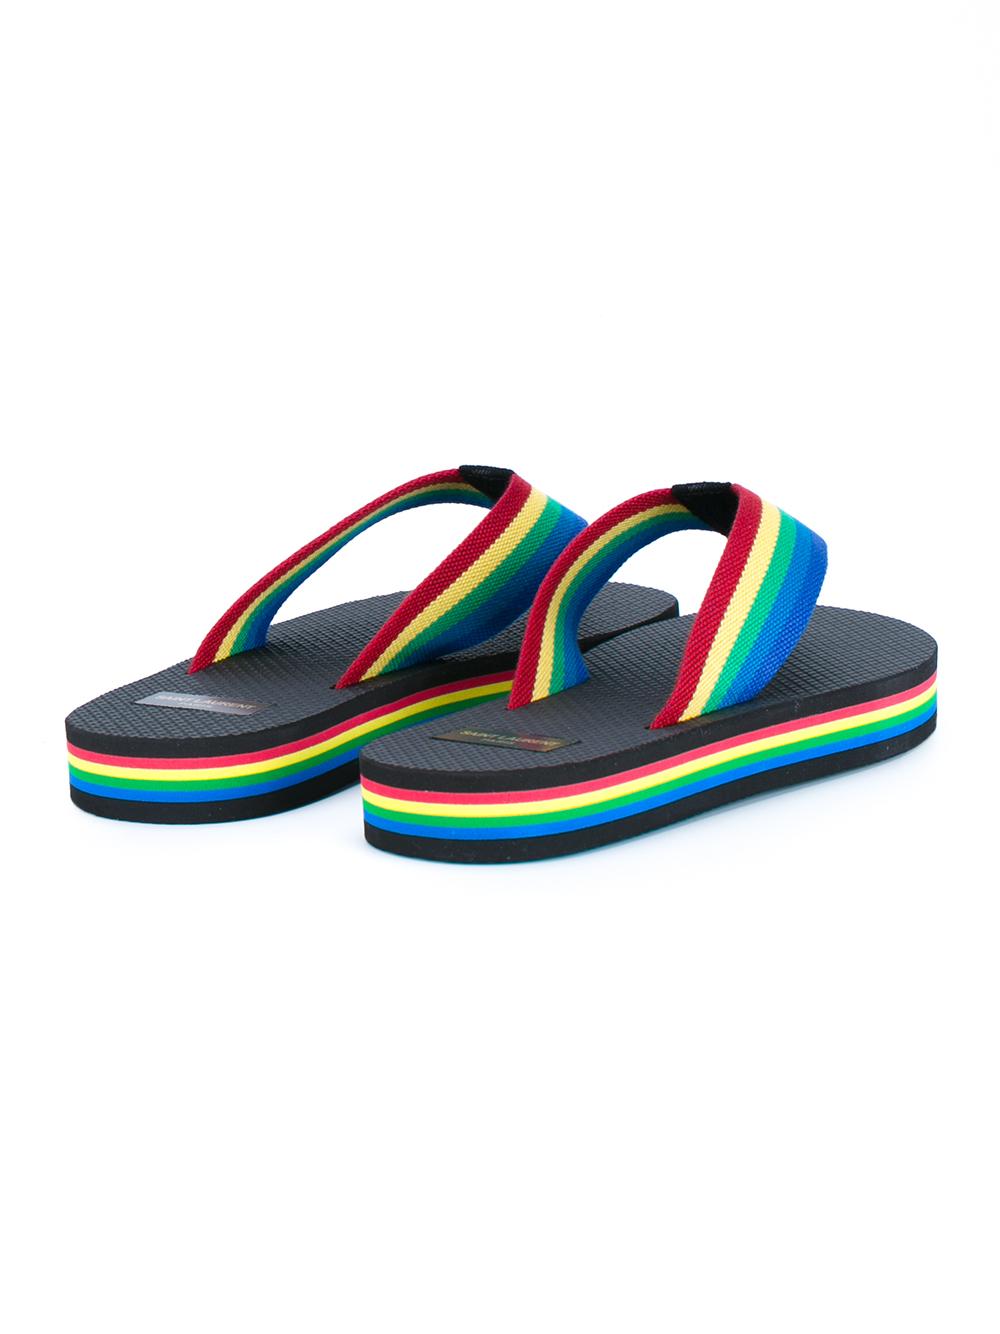 Saint Laurent Rainbow Flip-Flops In Black - Lyst-6617